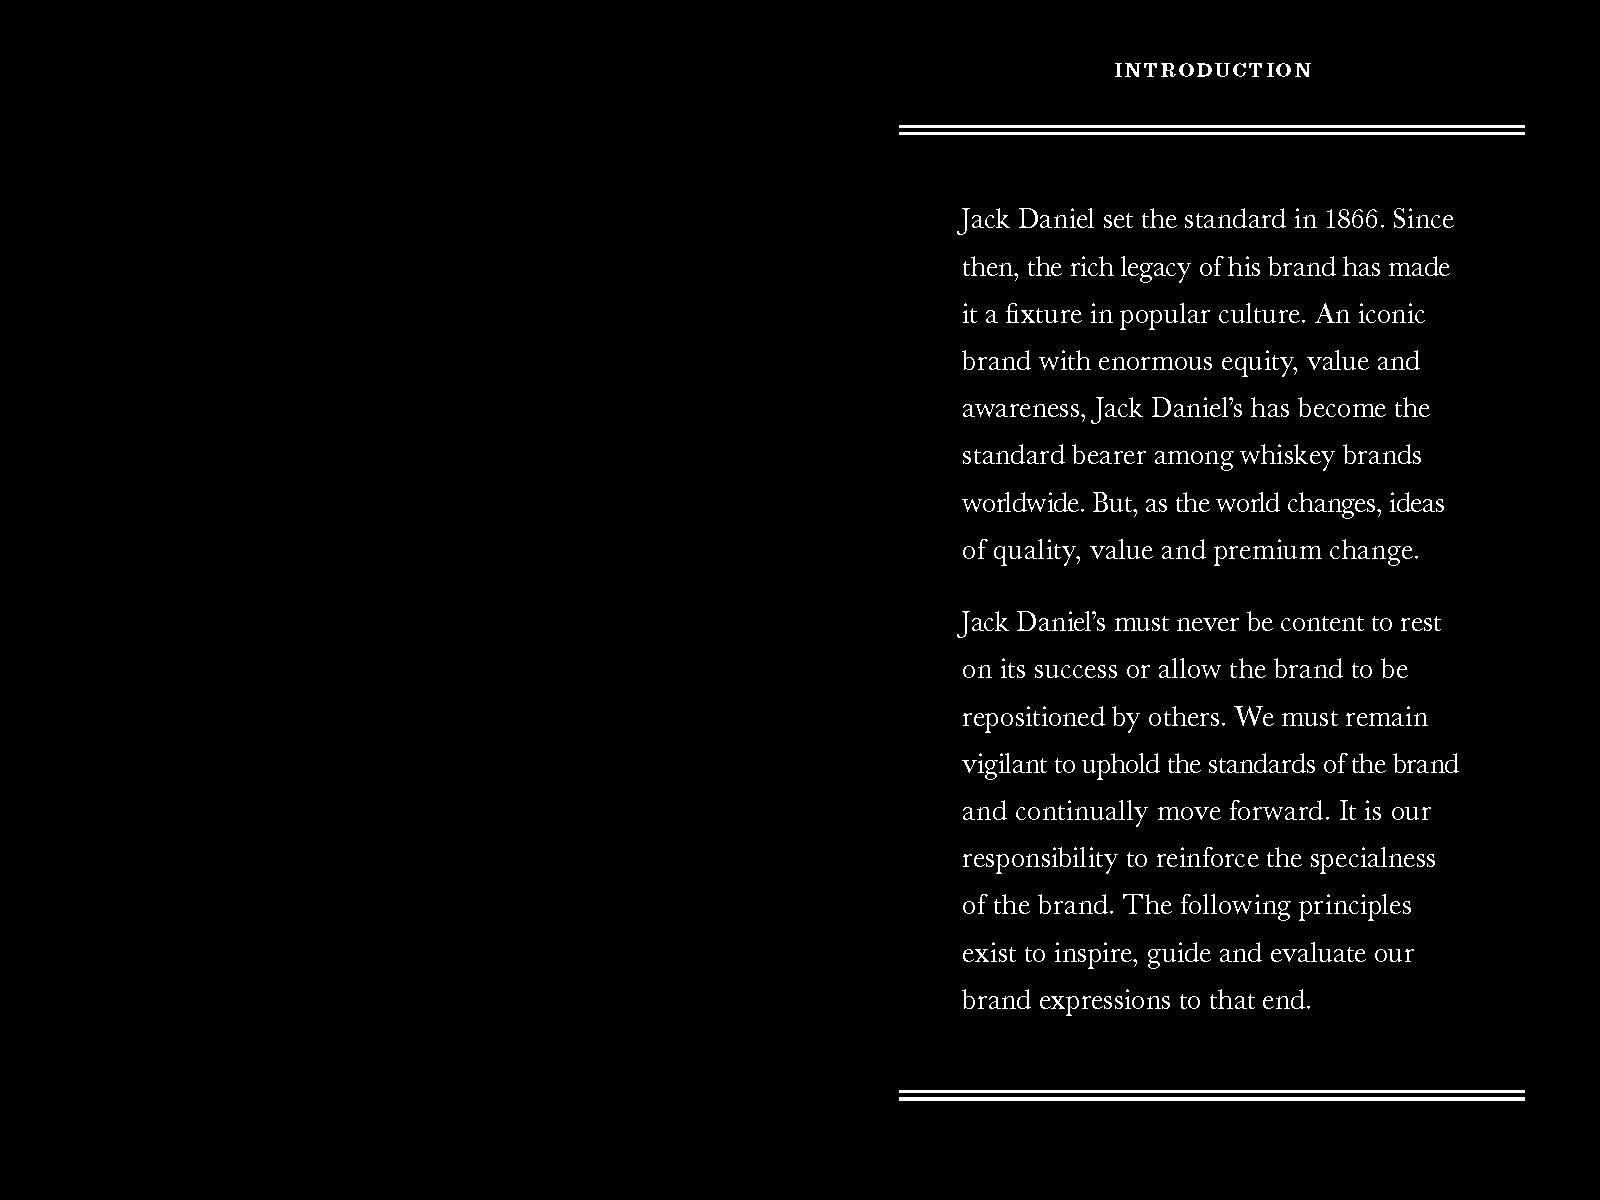 Jack Daniel's Guiding Principles 2012_Page_02.jpg